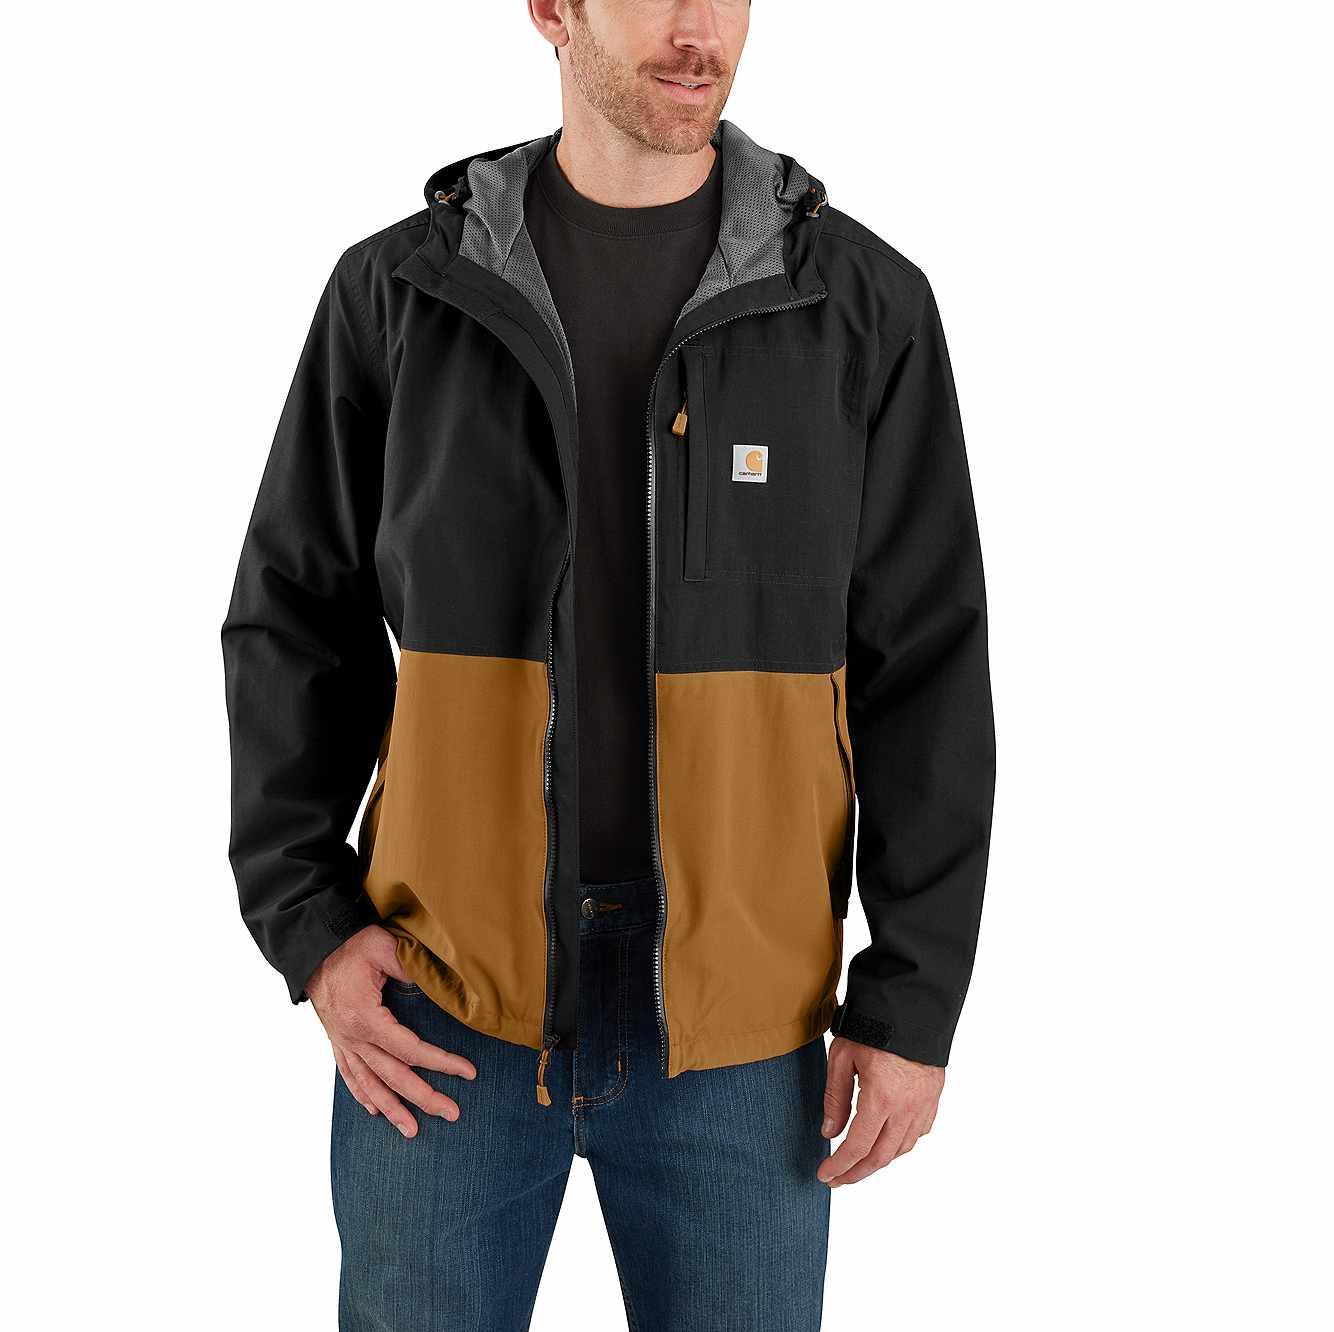 Picture of Storm Defender® Hooded Jacket in Black/Carhartt Brown